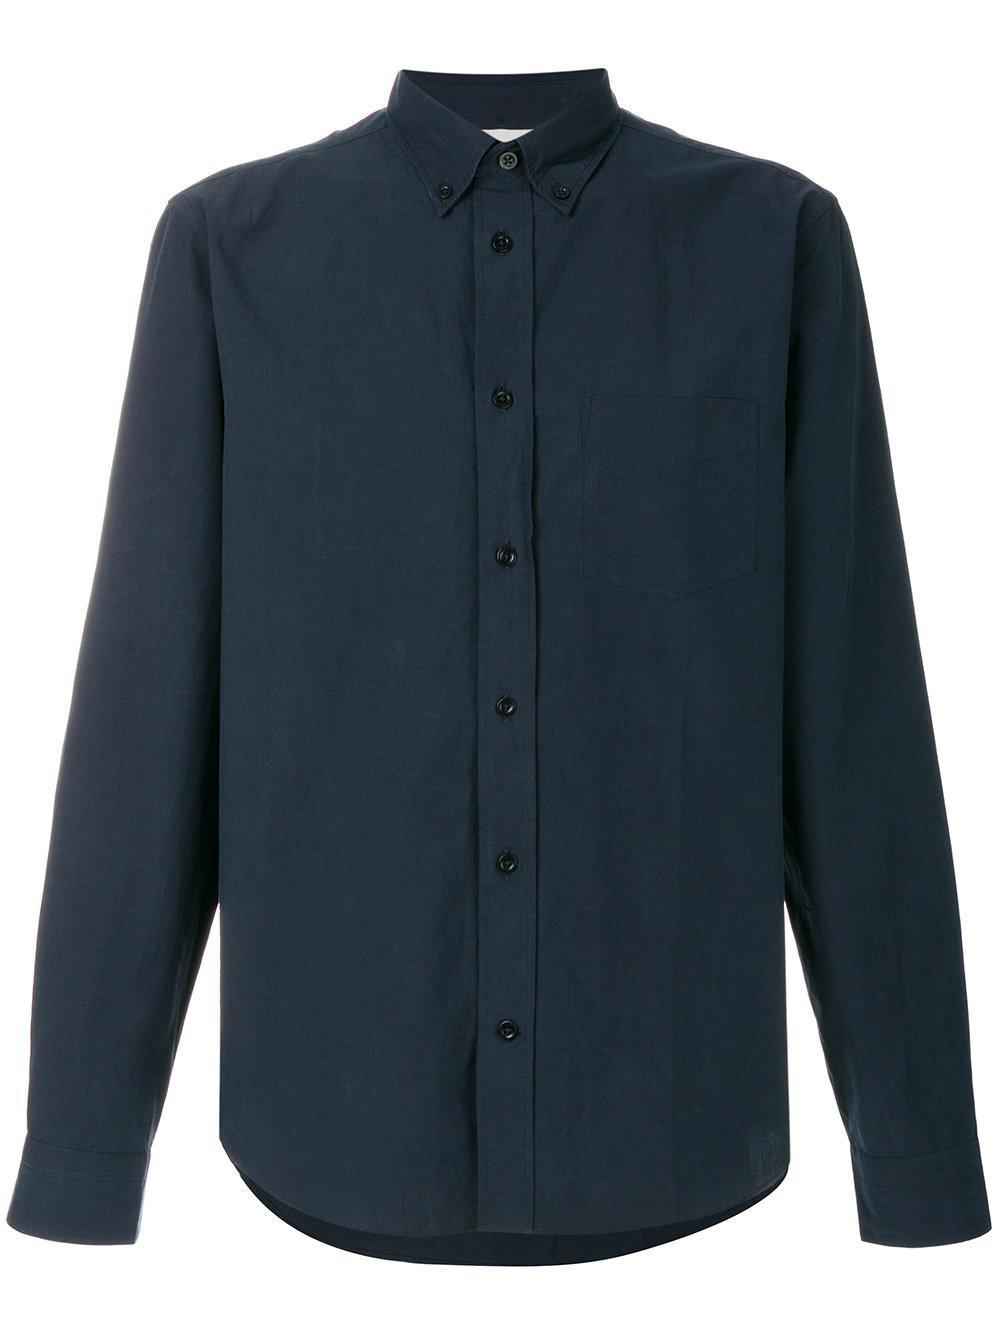 de77ca1b8f Lyst - Acne Studios Isherwood Shirt in Blue for Men